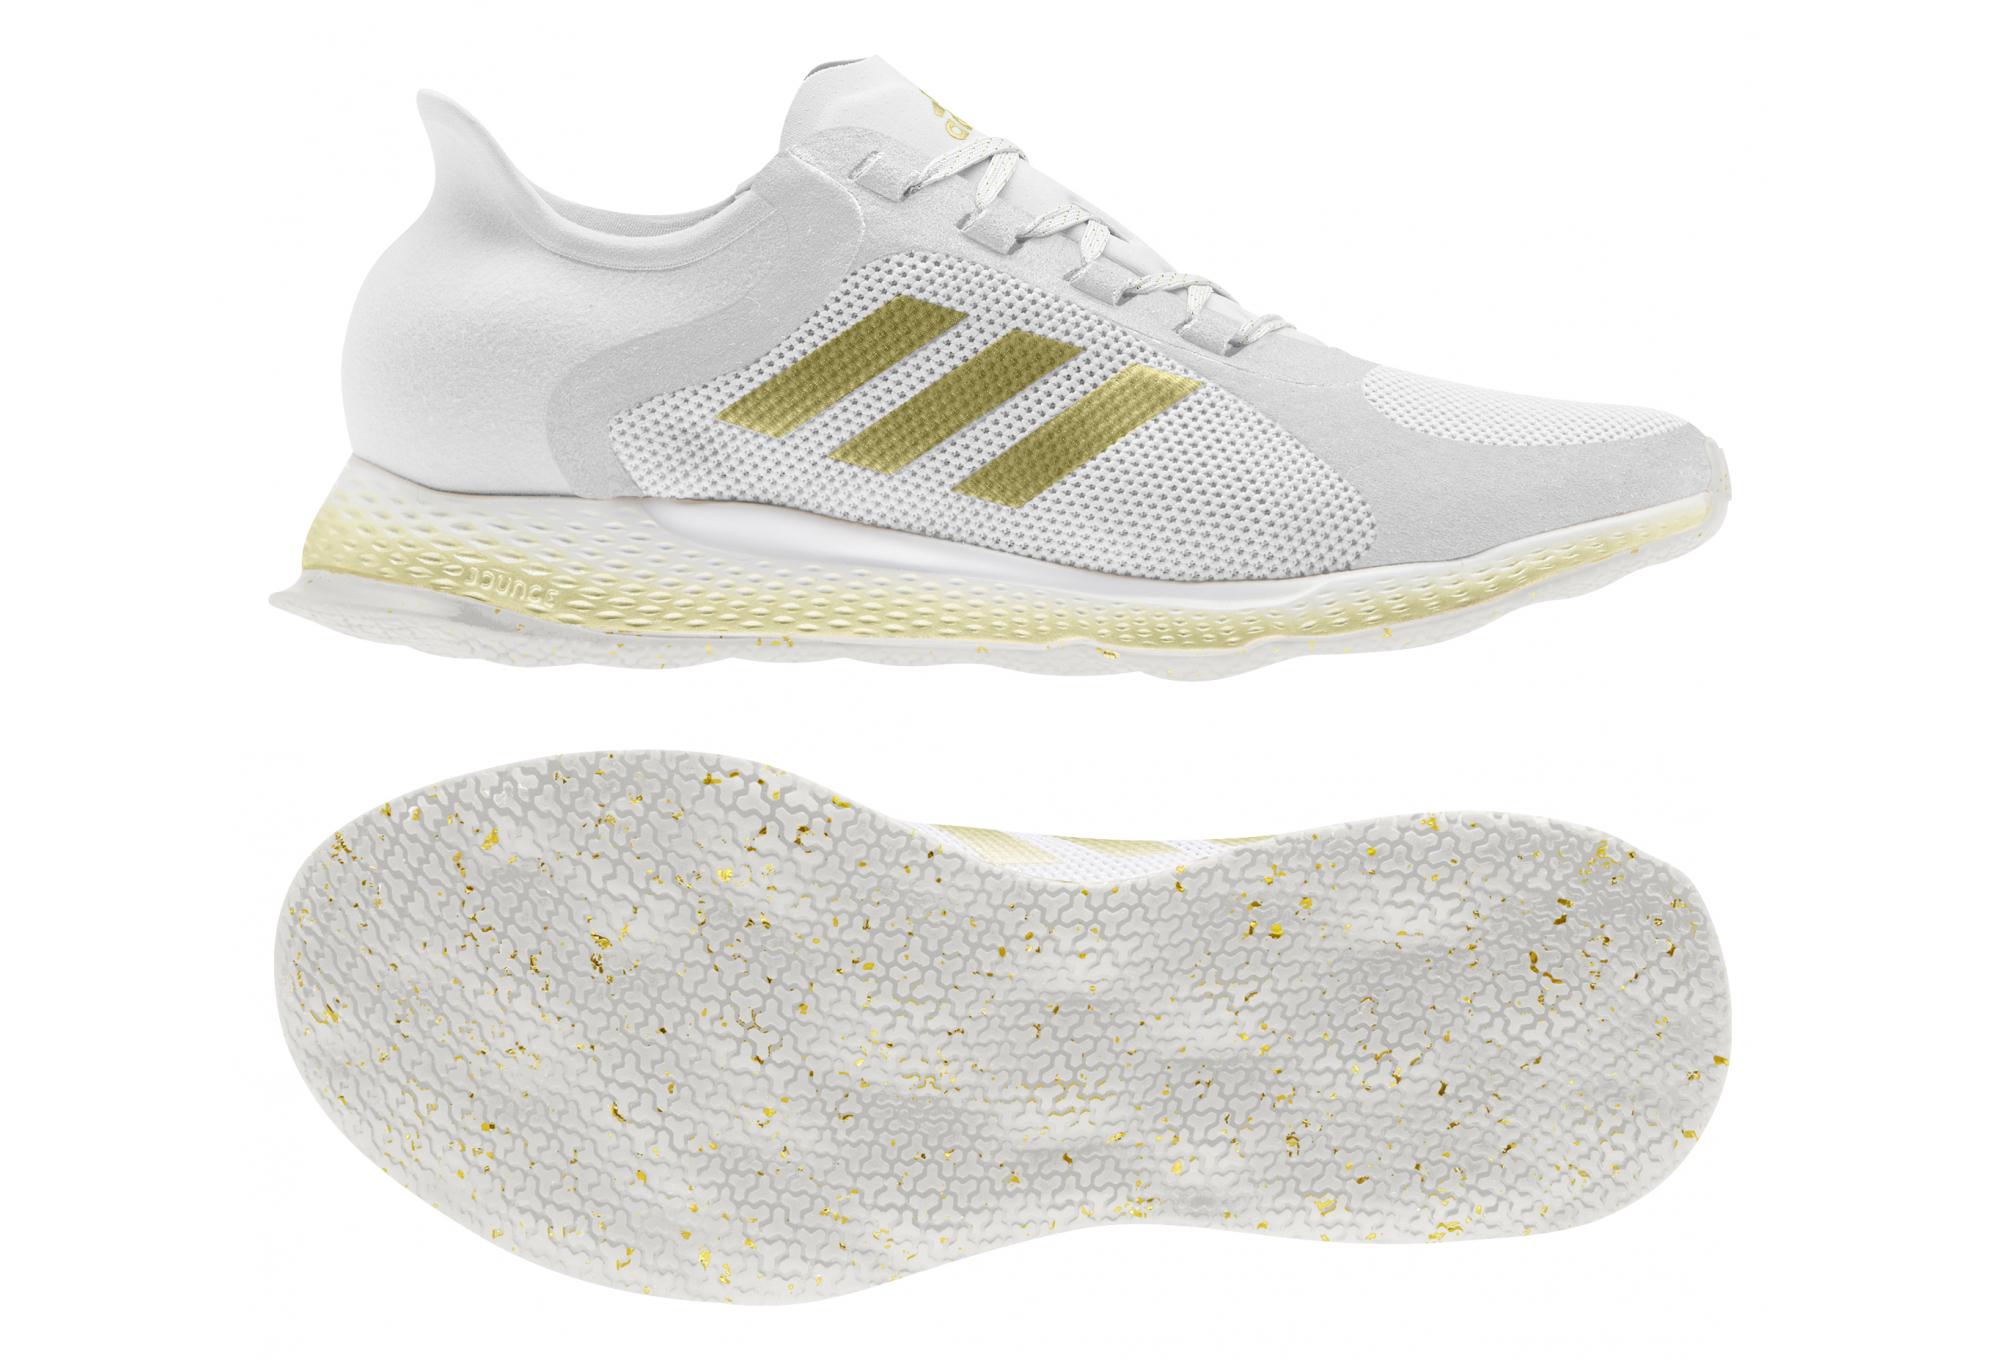 adidas focus chaussure femme